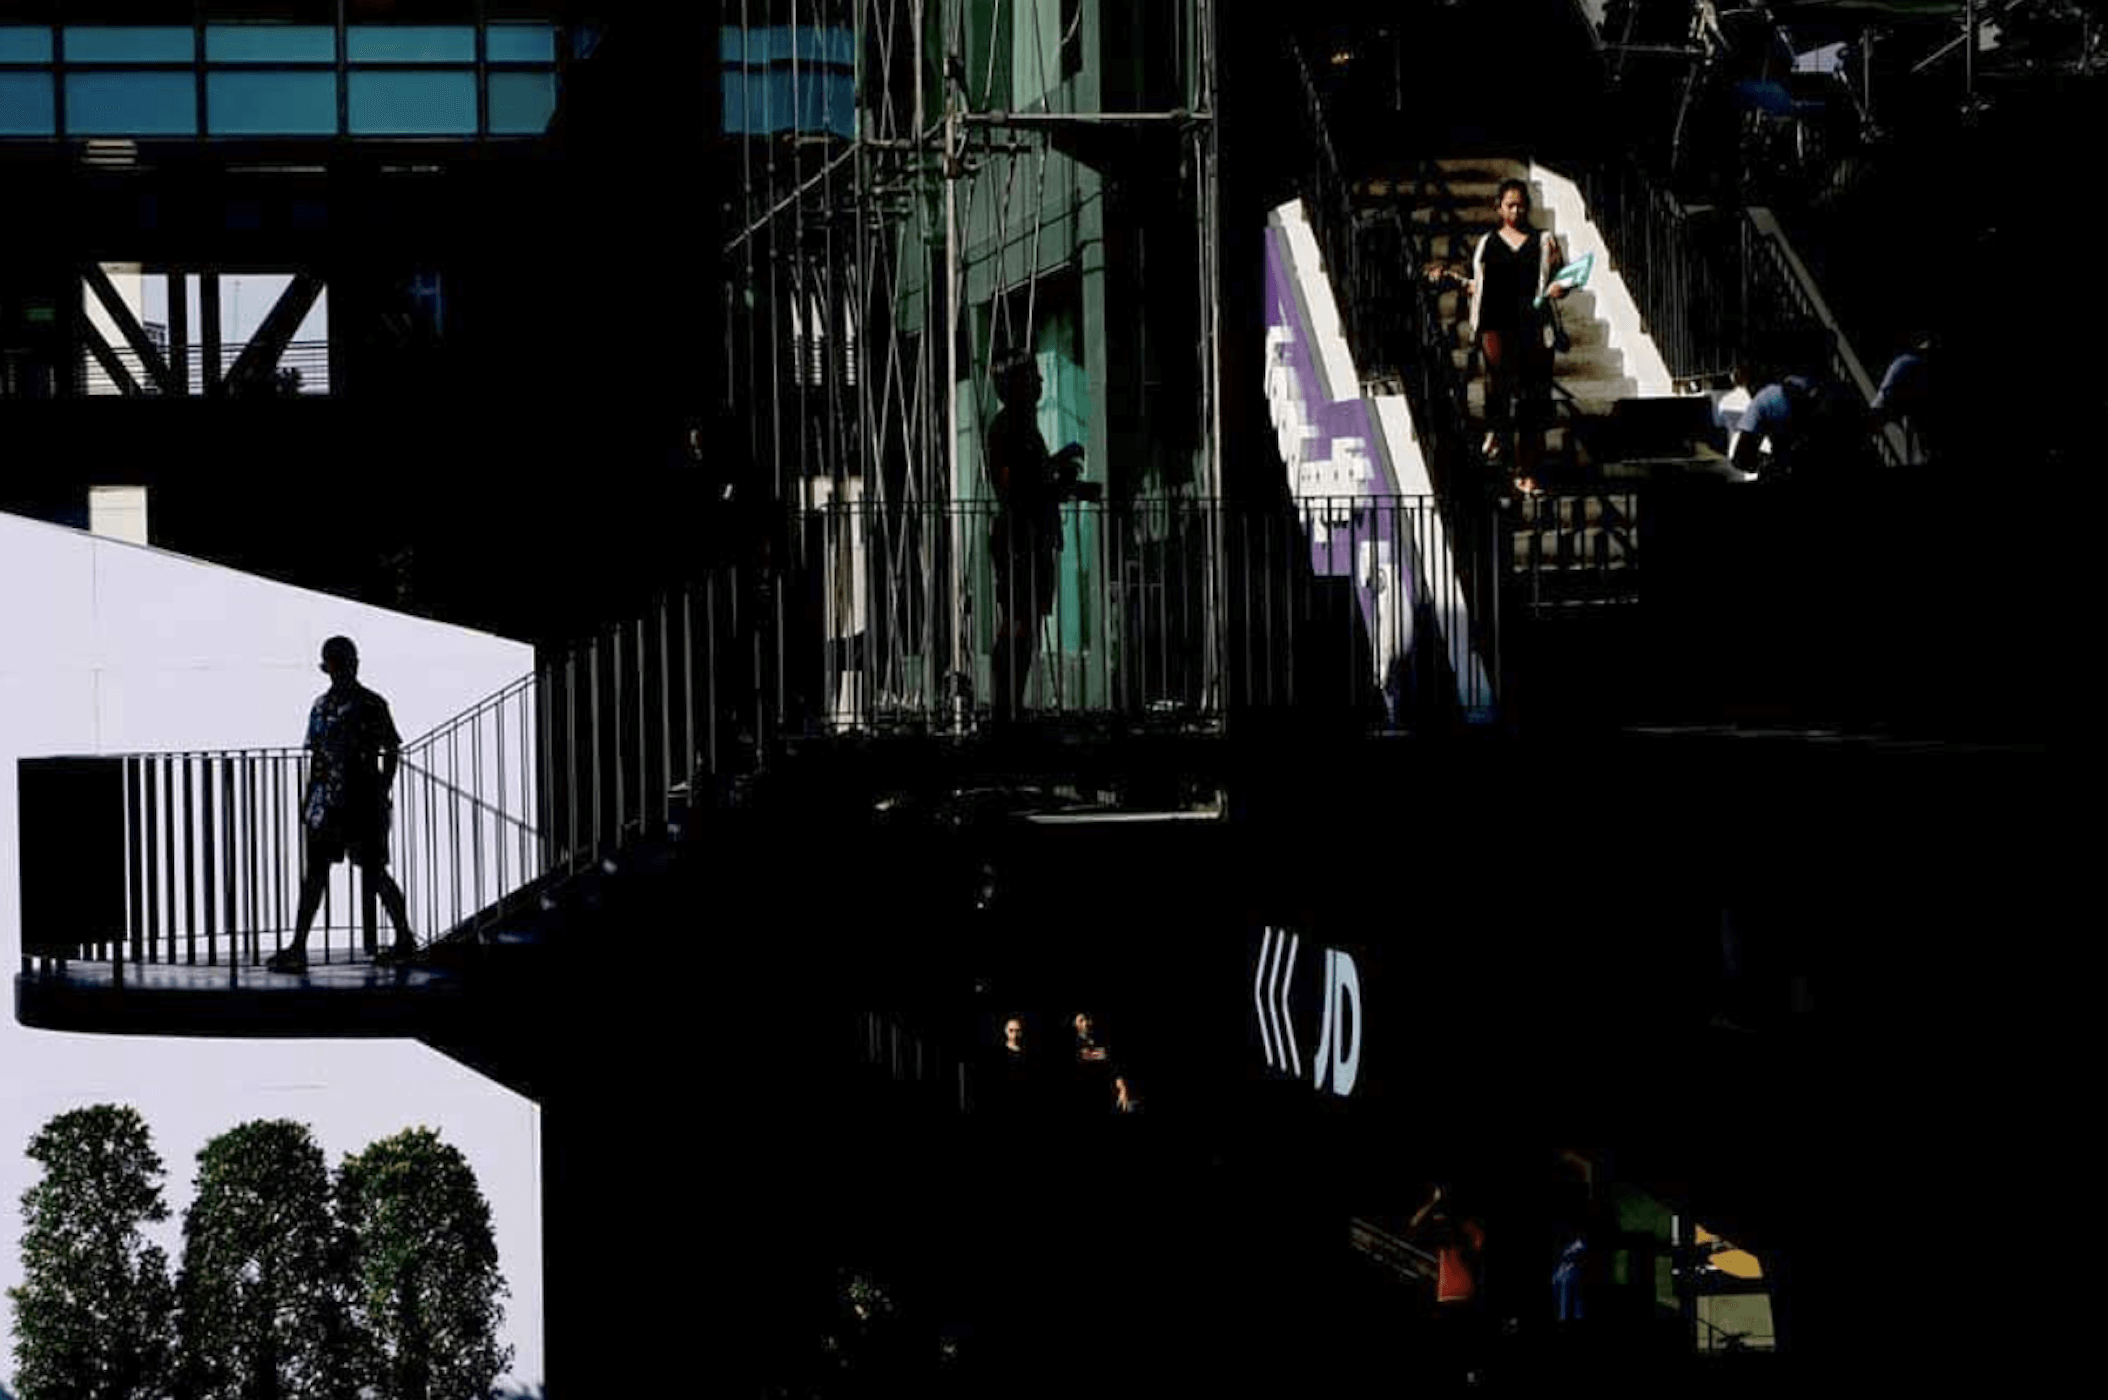 Art and Documentary Photography - Loading Supornchai_ratanamethanon.png